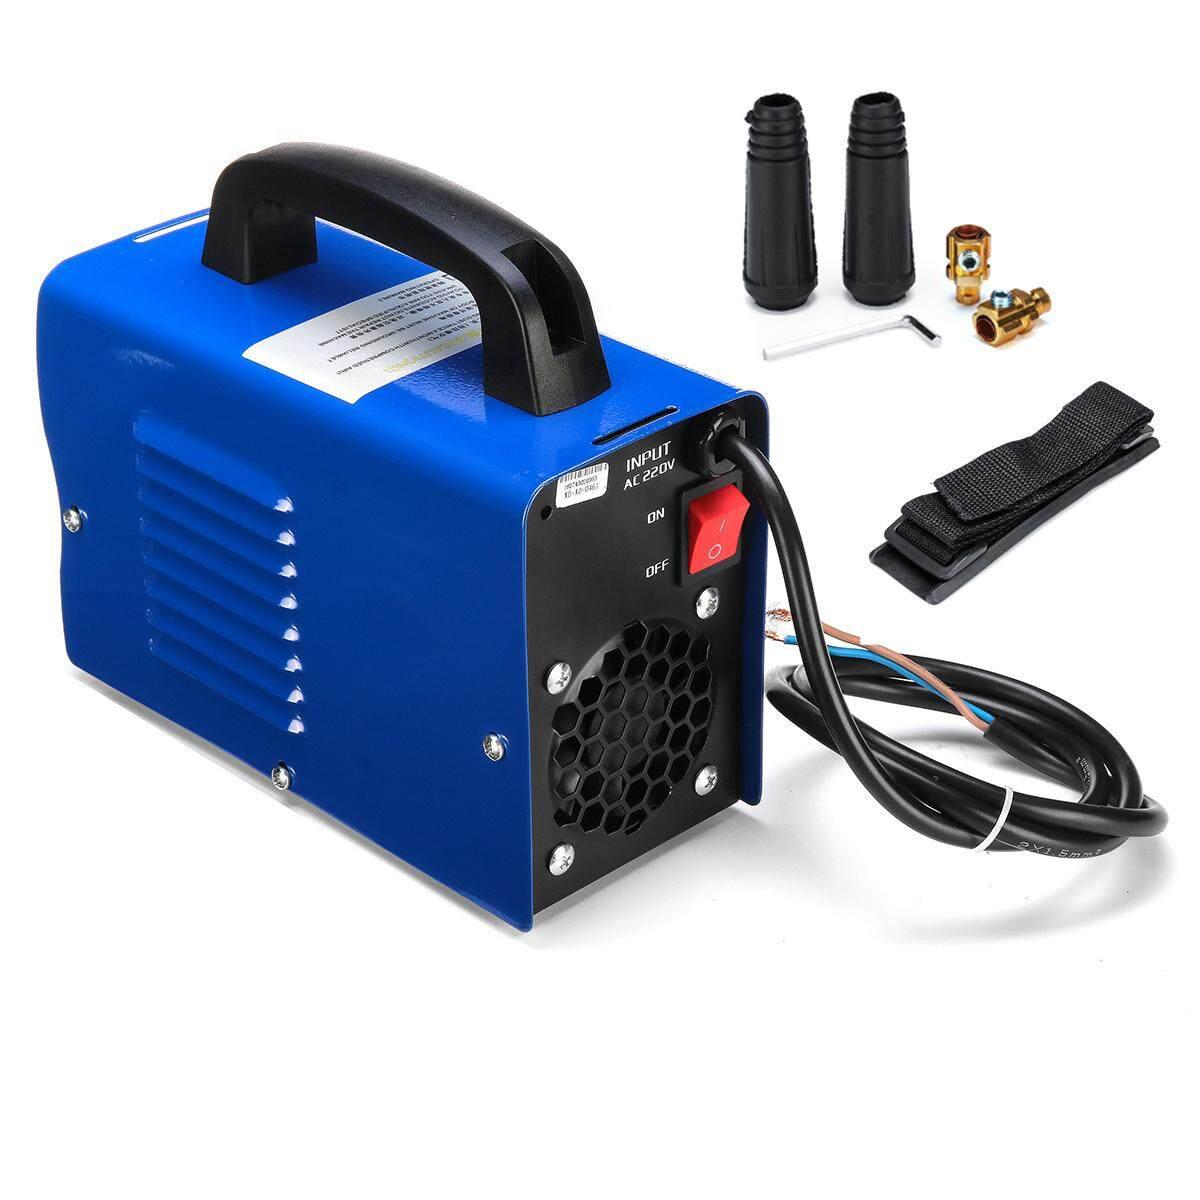 ZX7-200 220V DC Portable Household Mini Inverter Electric Welding Kit Machine UK